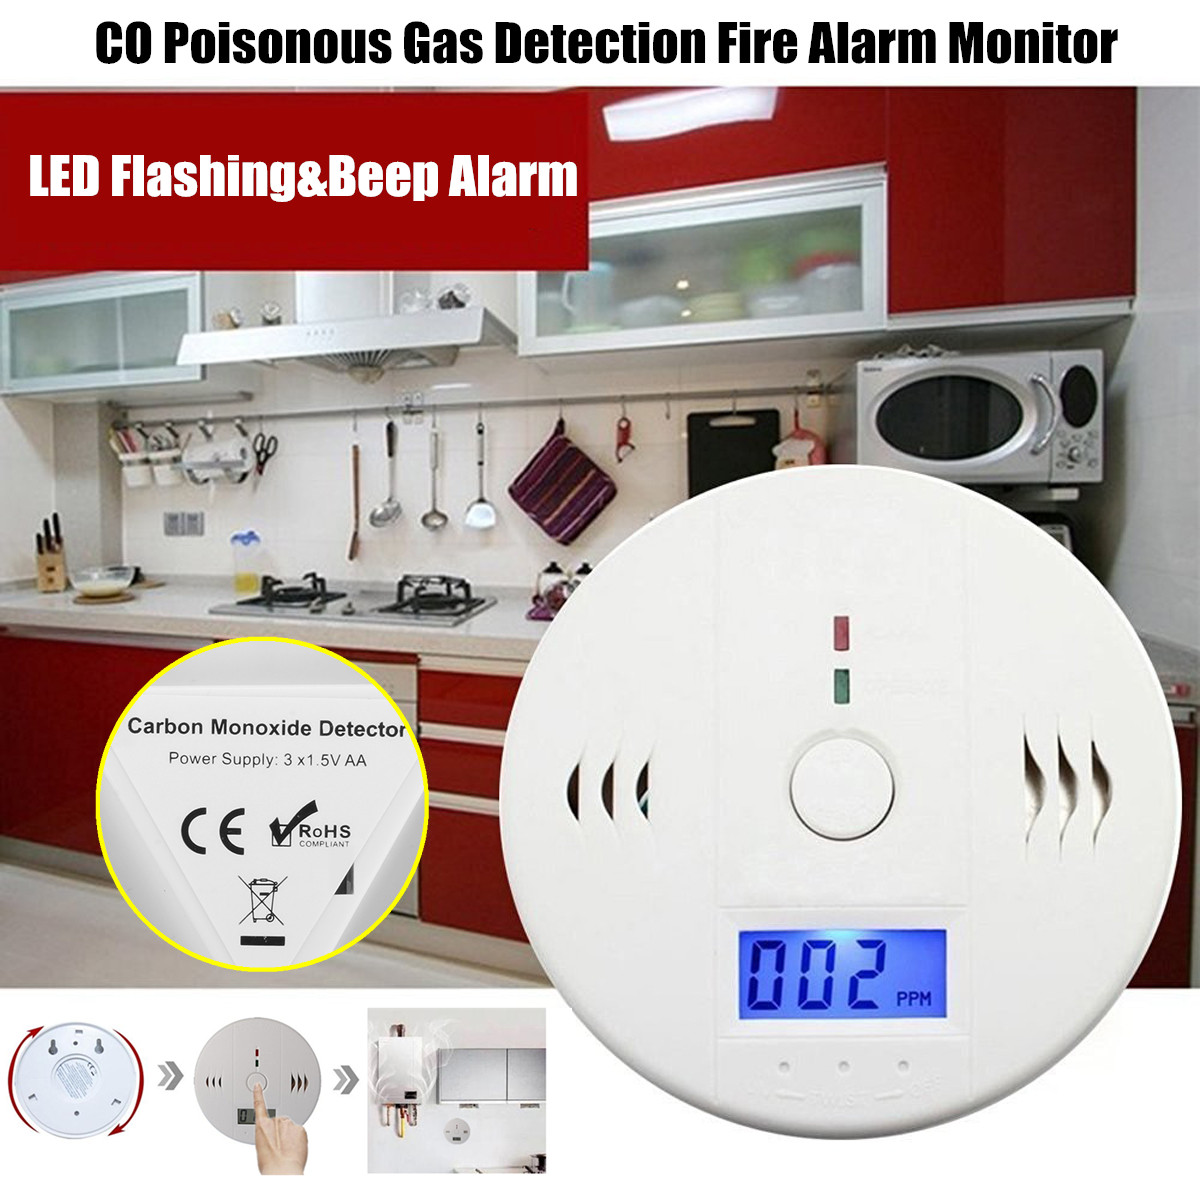 Digital LCD Display for CO Level CO Carbon Monoxide Sensor Alarm Alert Detector Tester Monitor Poisonous Gas Detection Fire Sound Light Alarm Warning